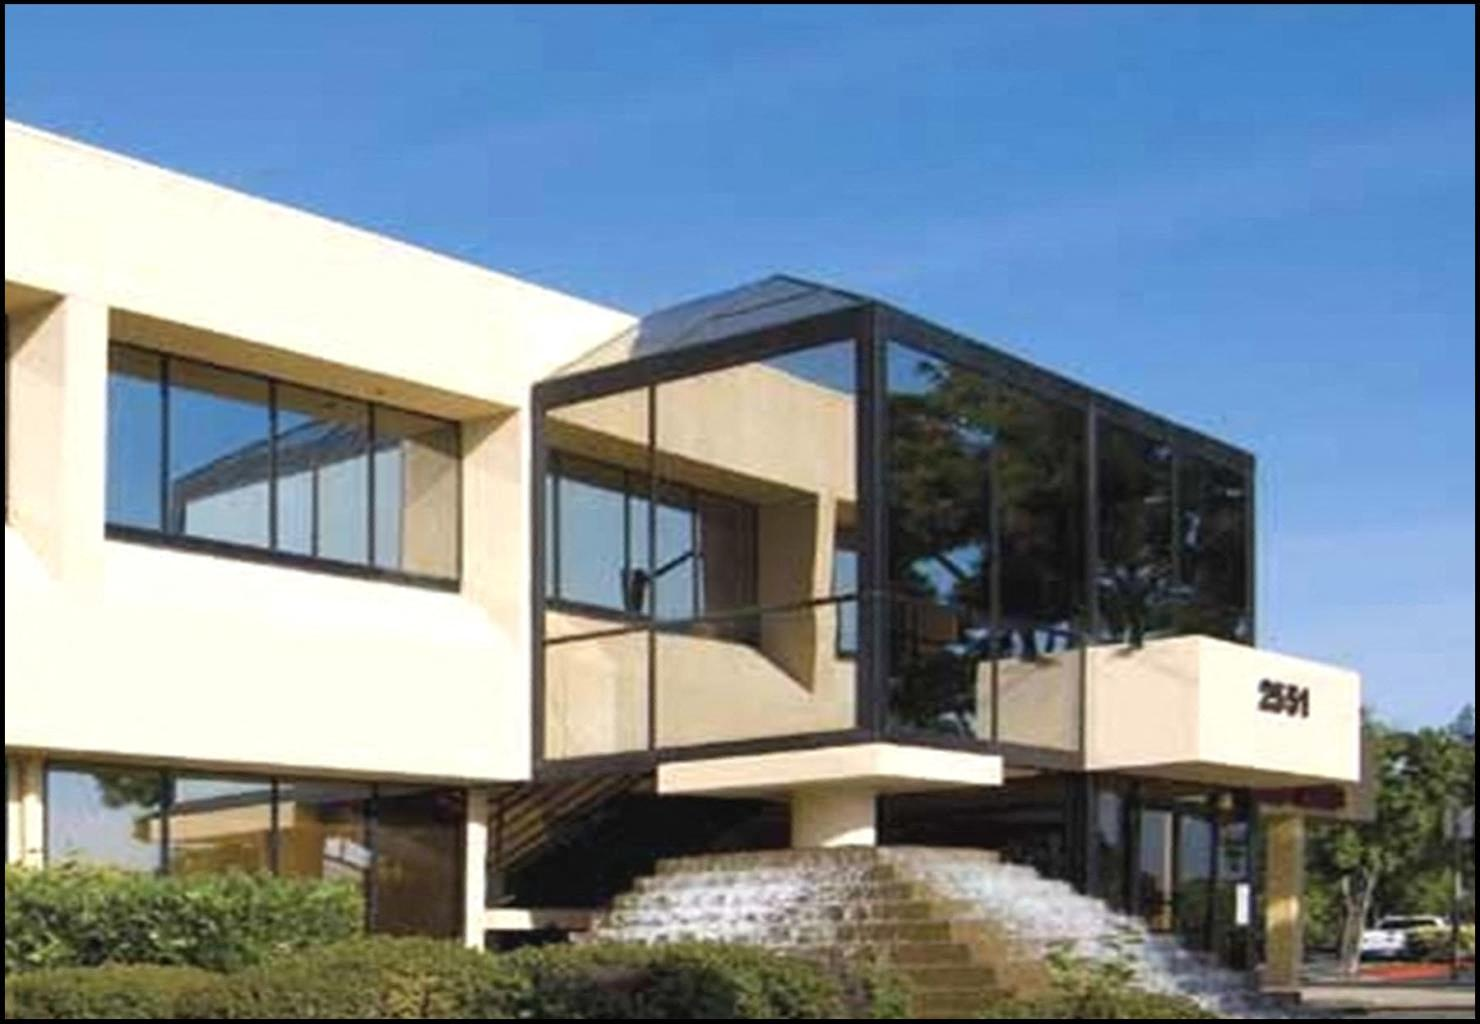 2551 San Ramon Valley Blvd, Suite 225